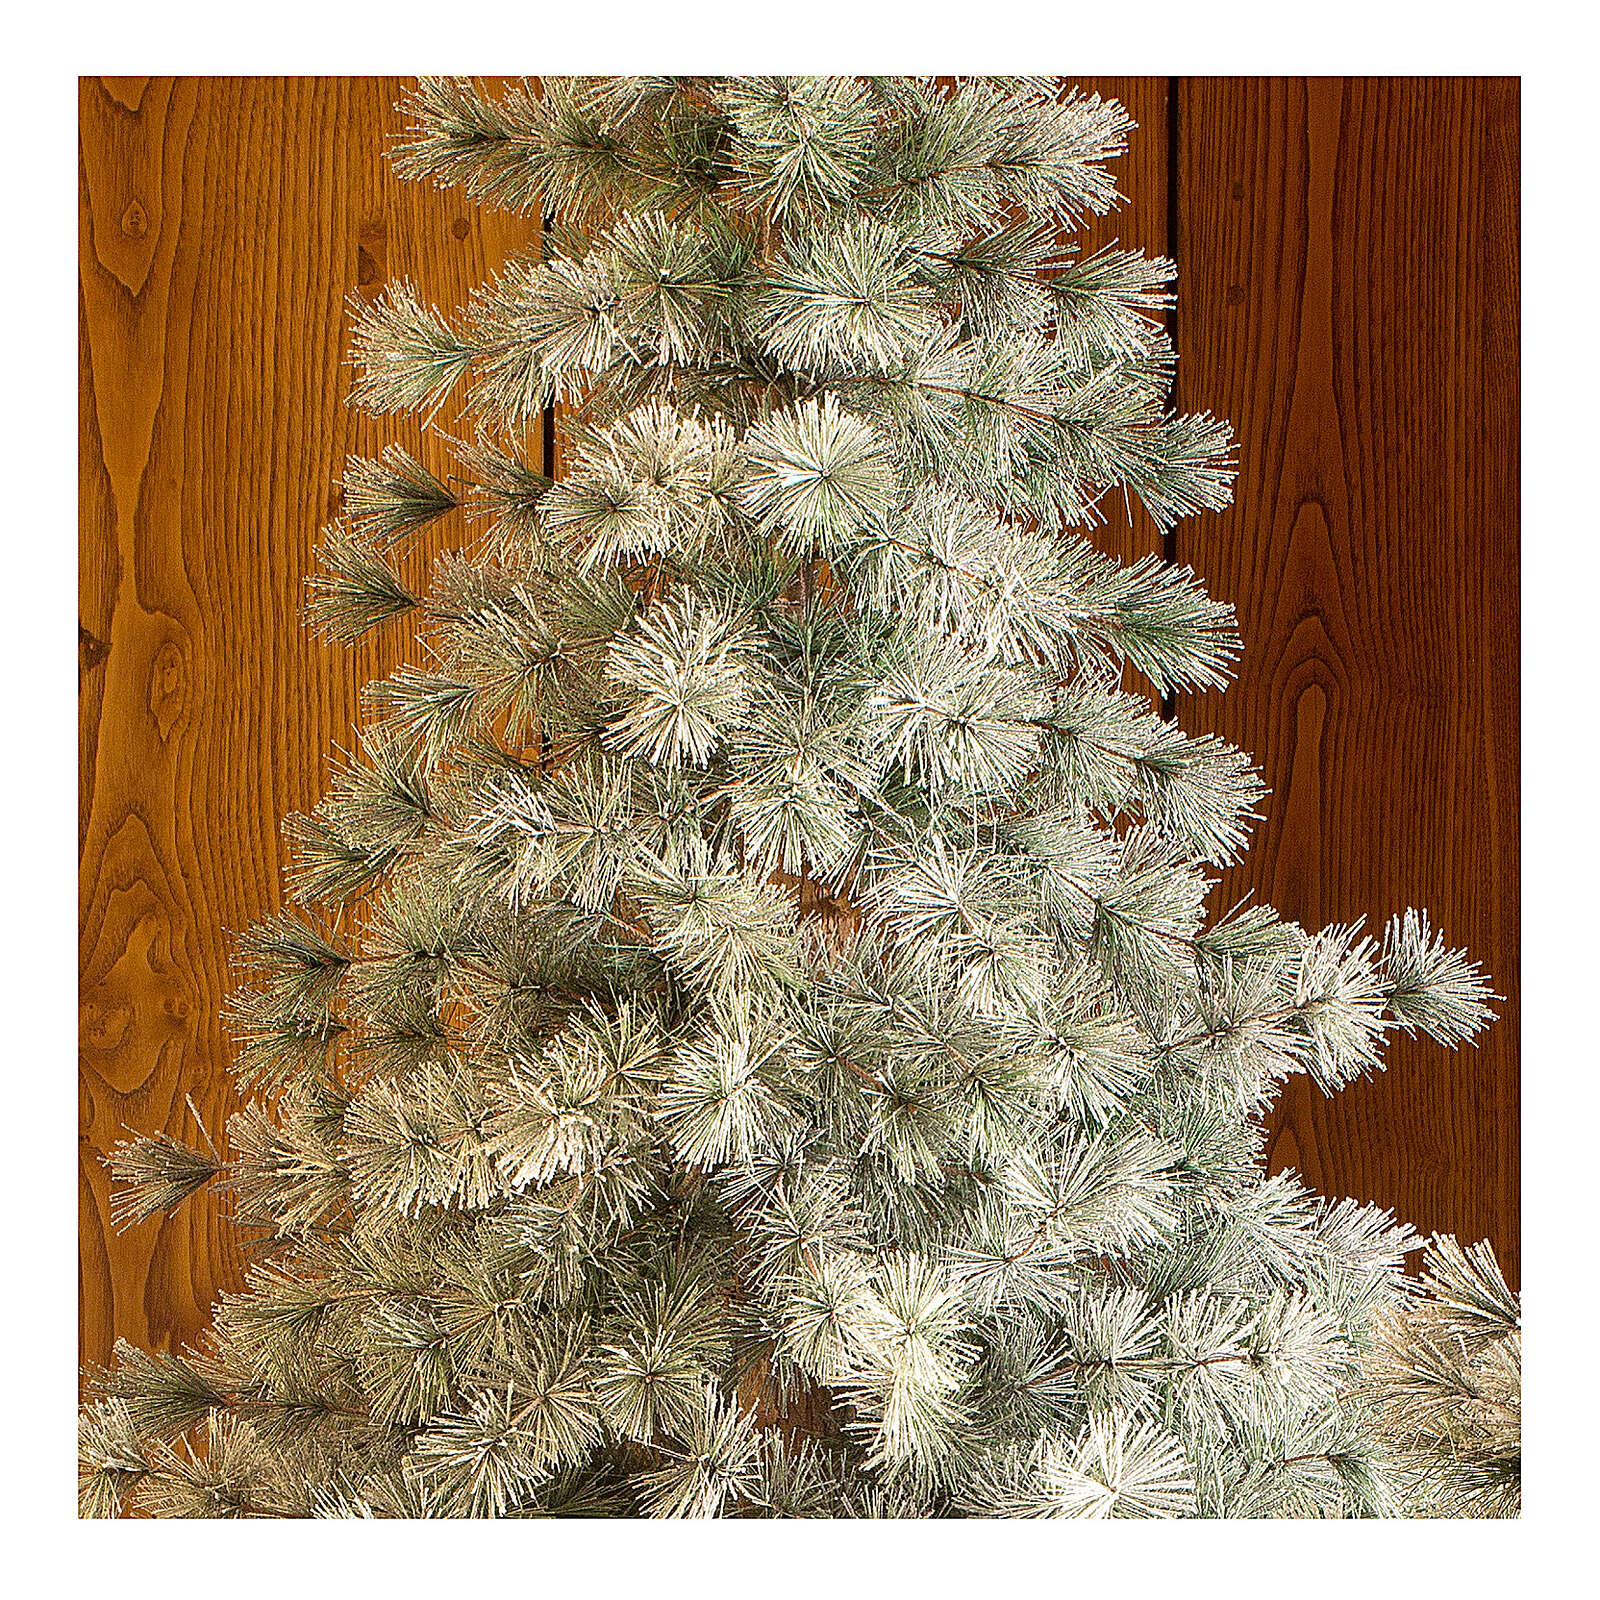 STOCK Snowy Aspen Pine Christmas tree 180 cm 3